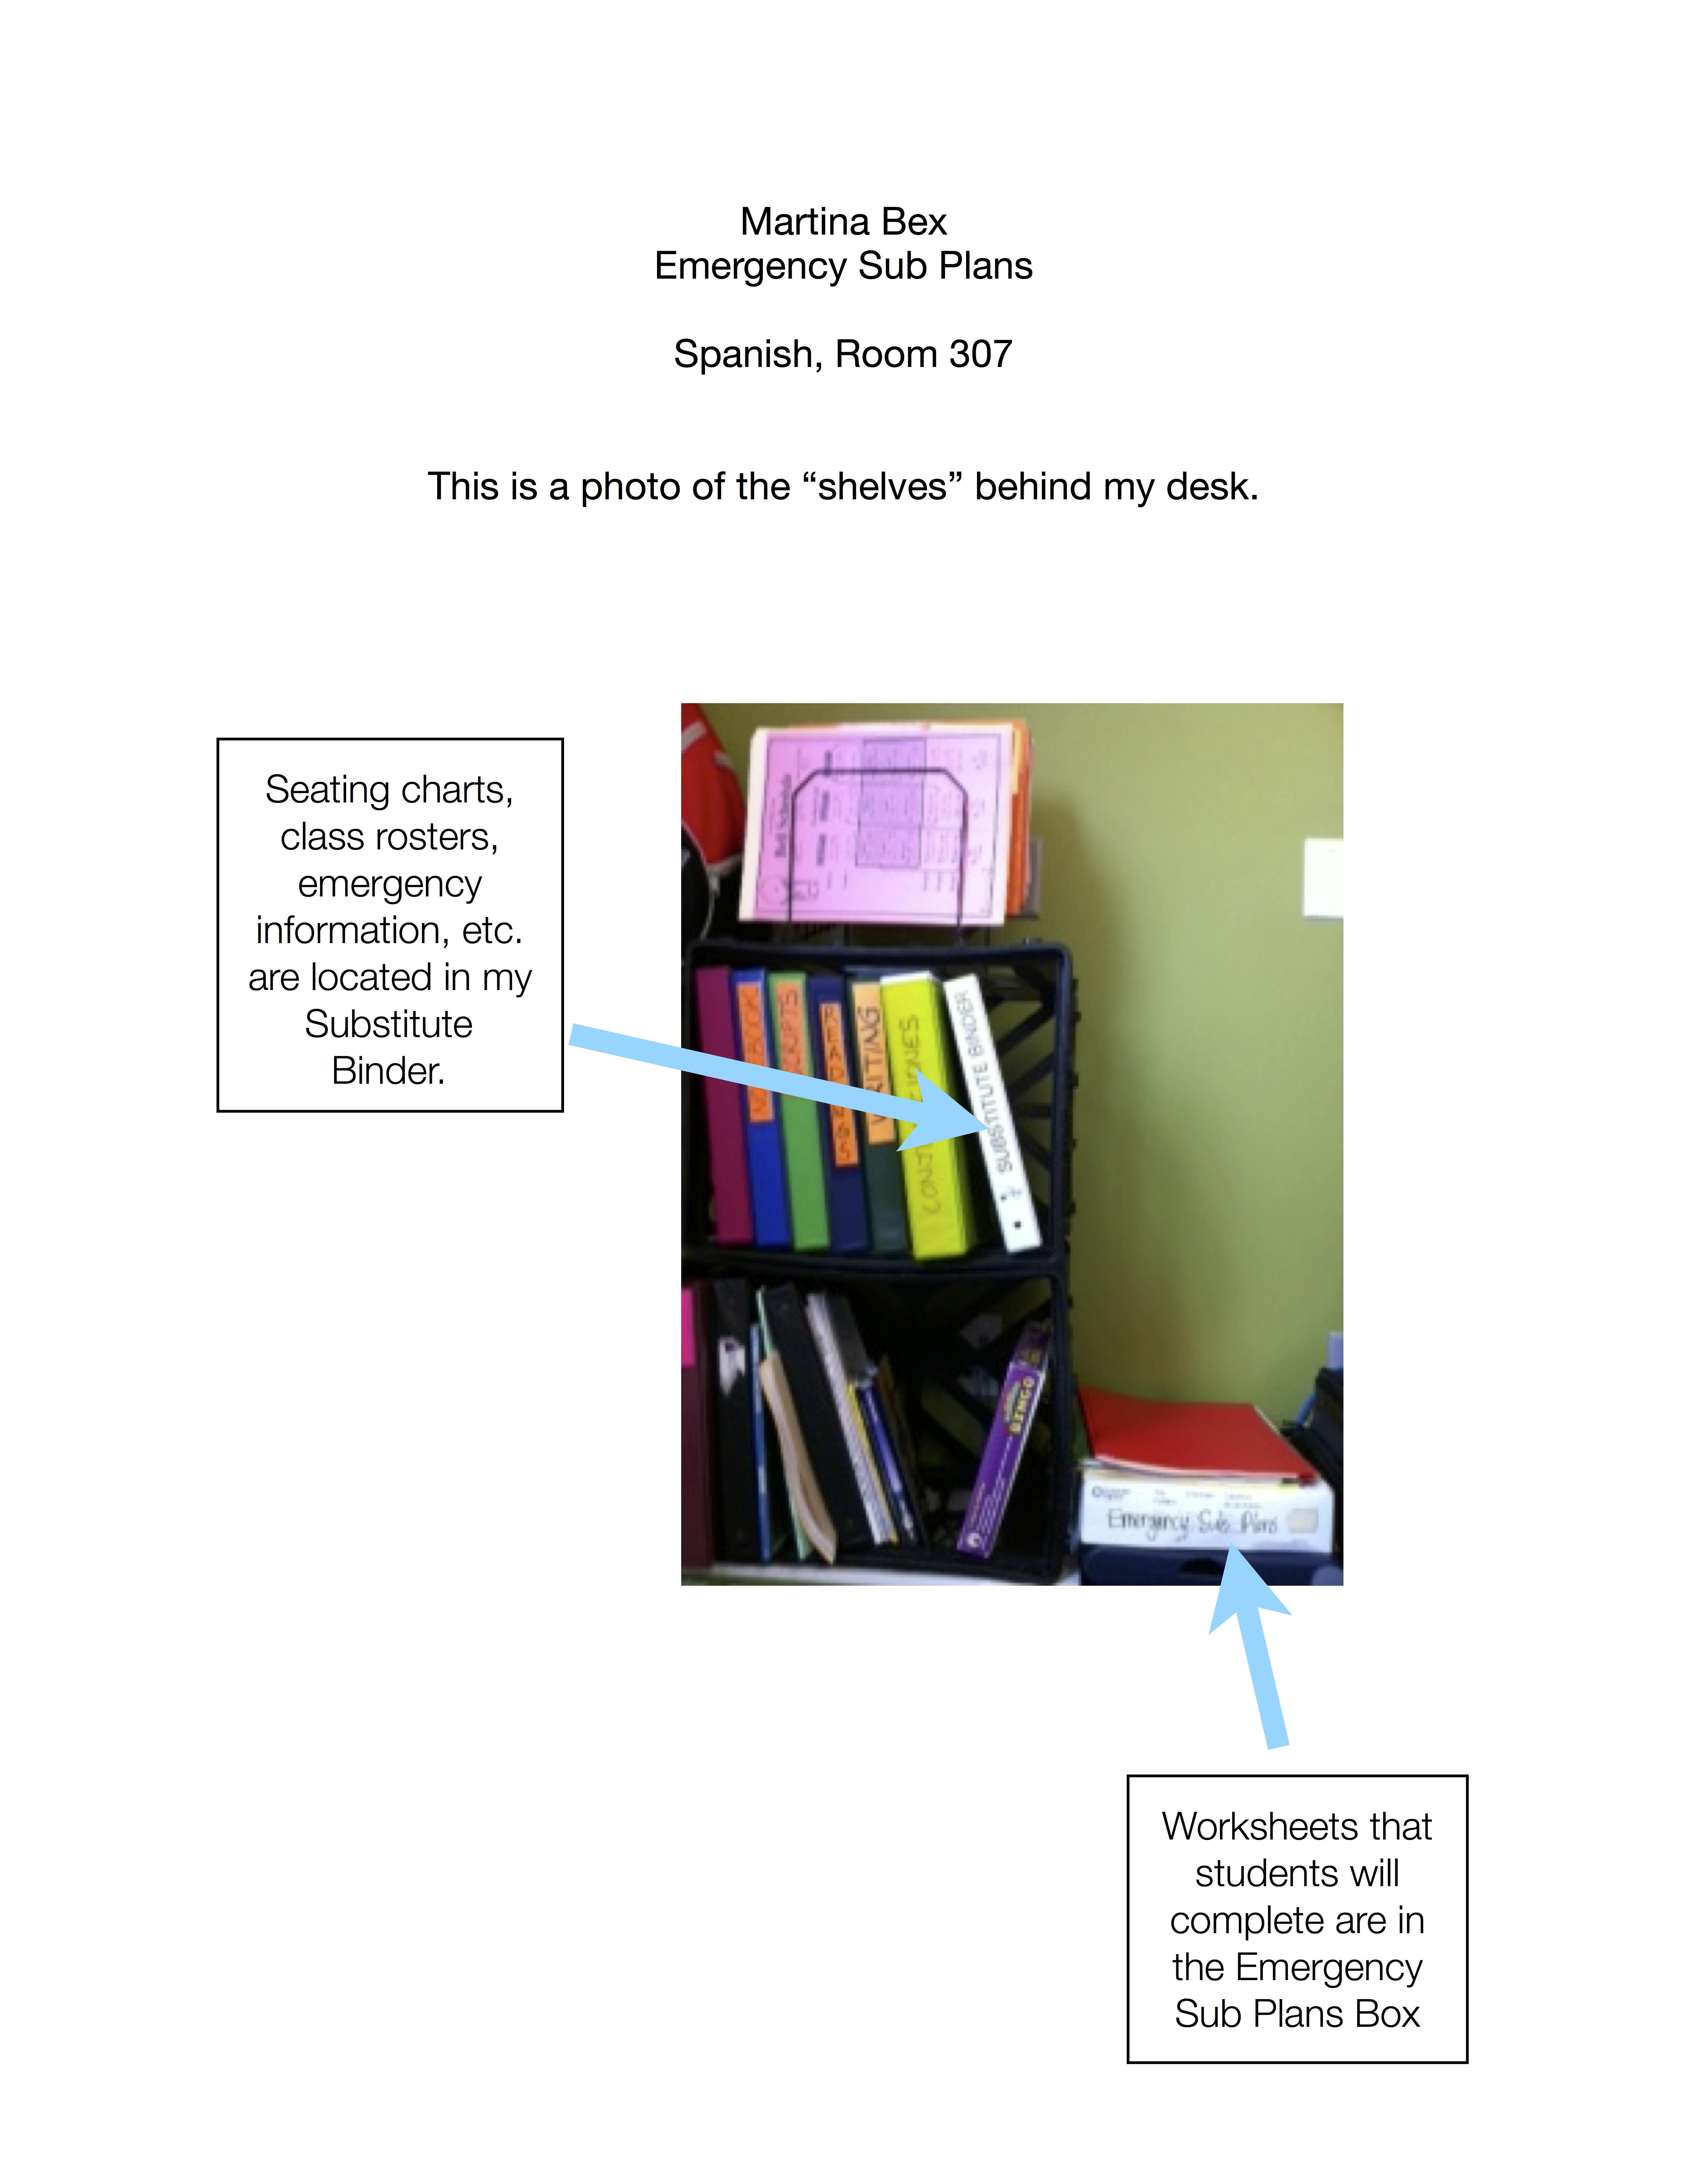 Emergency Sub Plans a la TPRS - The Comprehensible Classroom